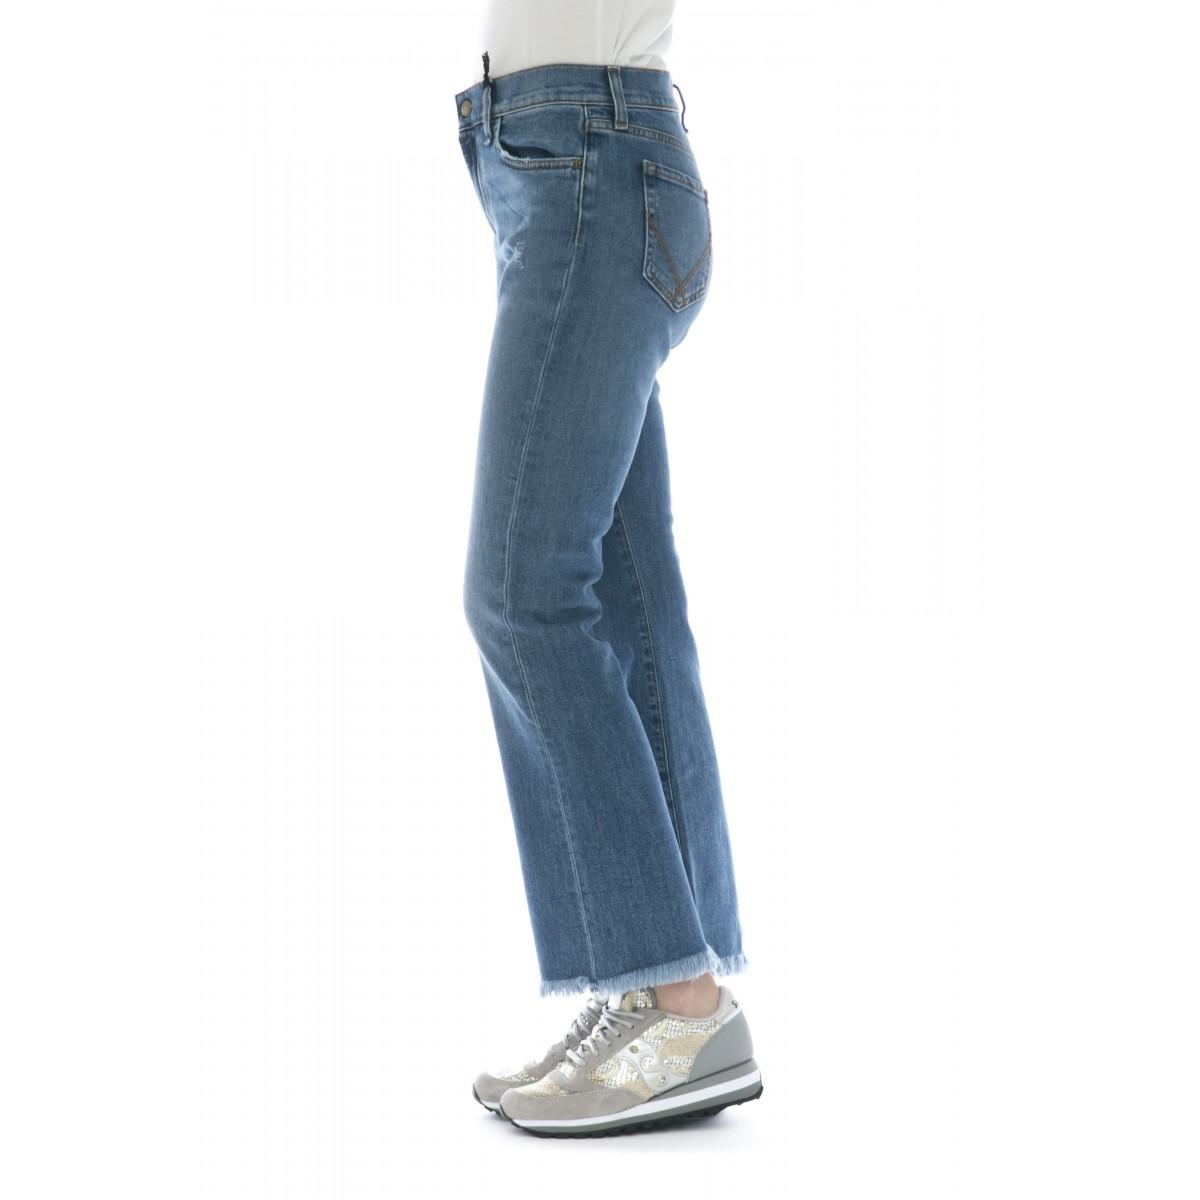 Jeans - Zandra sue slim boot cut